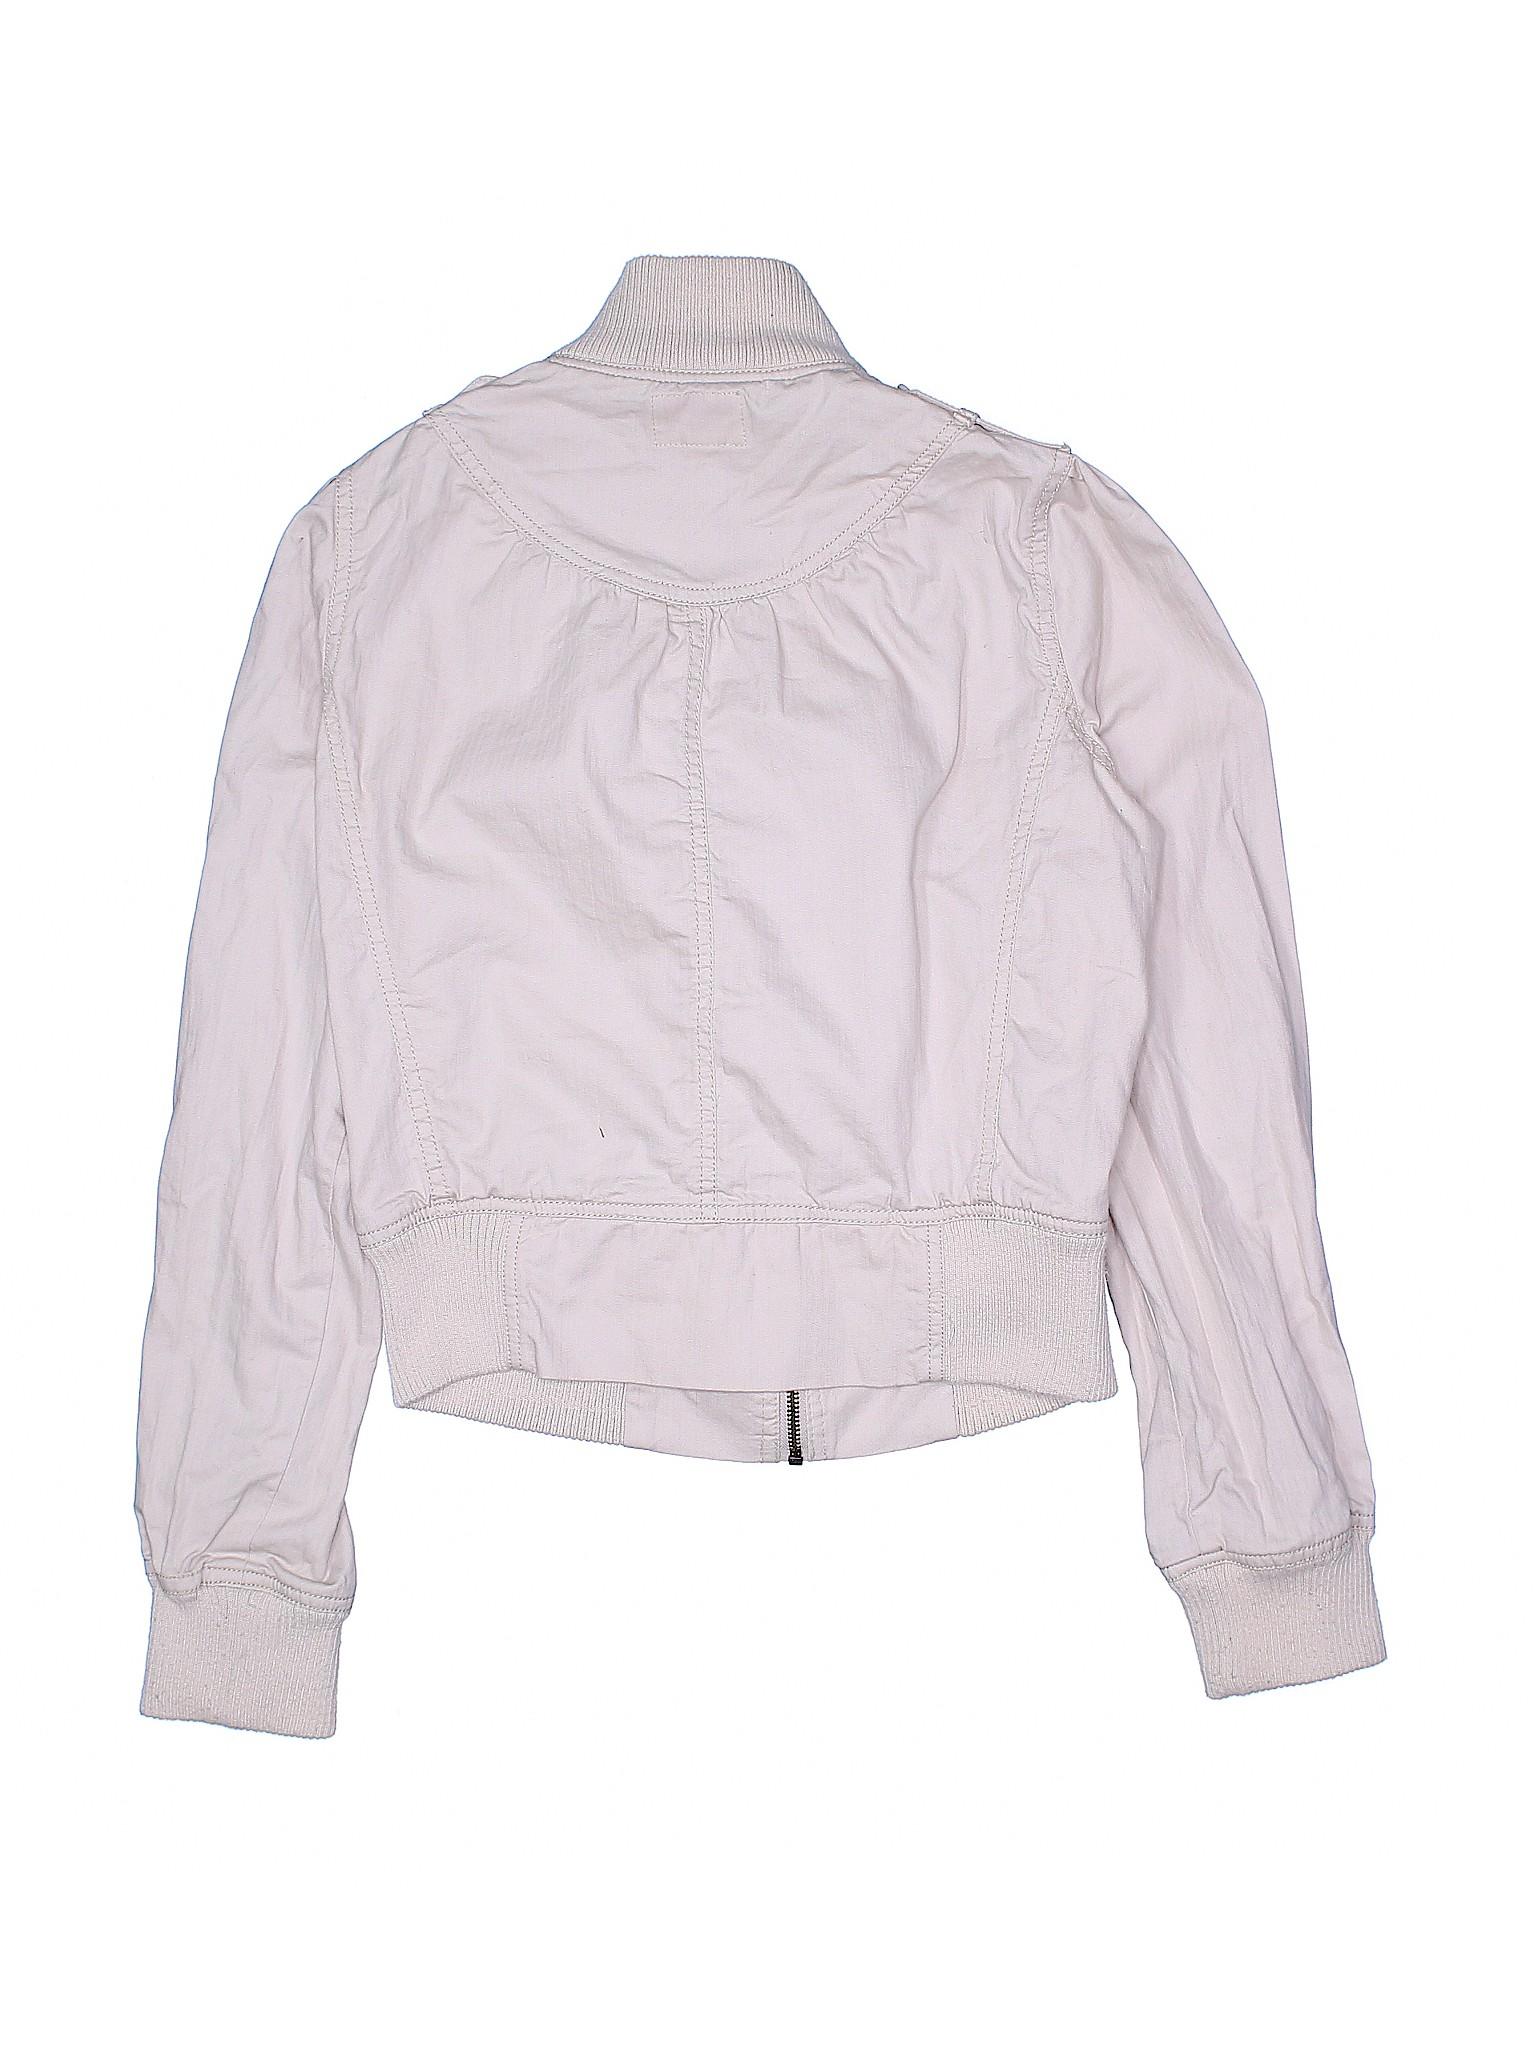 leisure Forever Boutique Jacket leisure 21 Forever Boutique q11rSwFOt